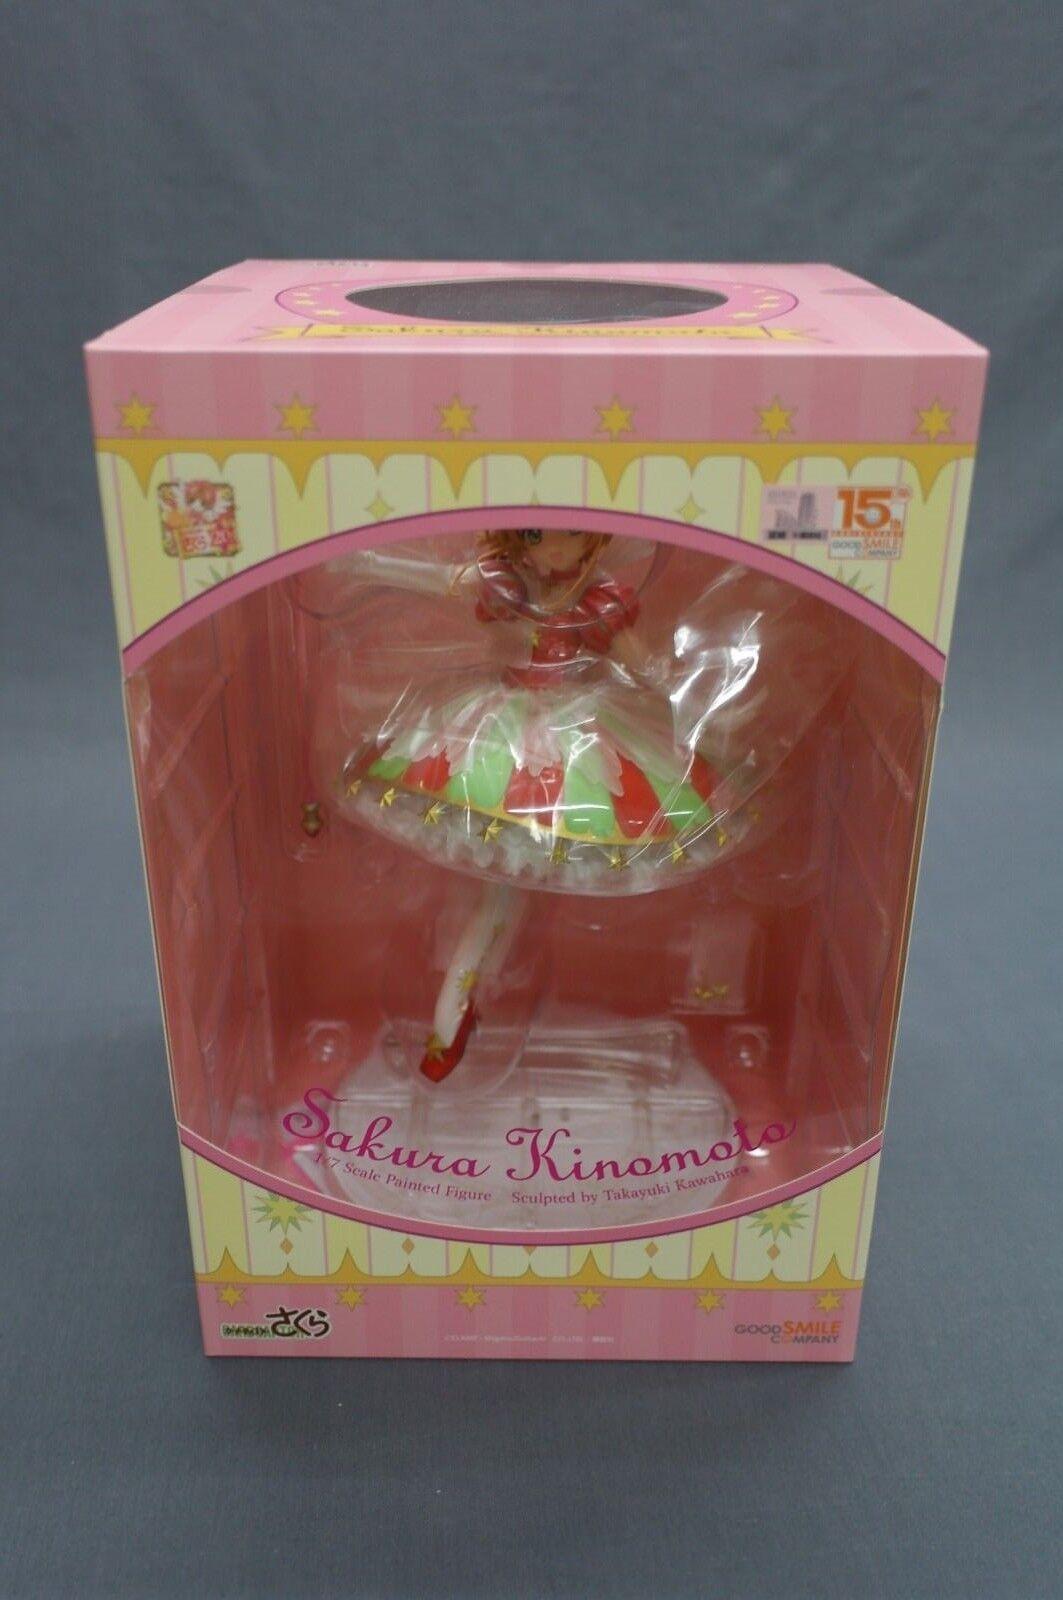 Cardcaptor Sakura Kinomoto Sakura 1 7 Good Smile Company Japan NEW